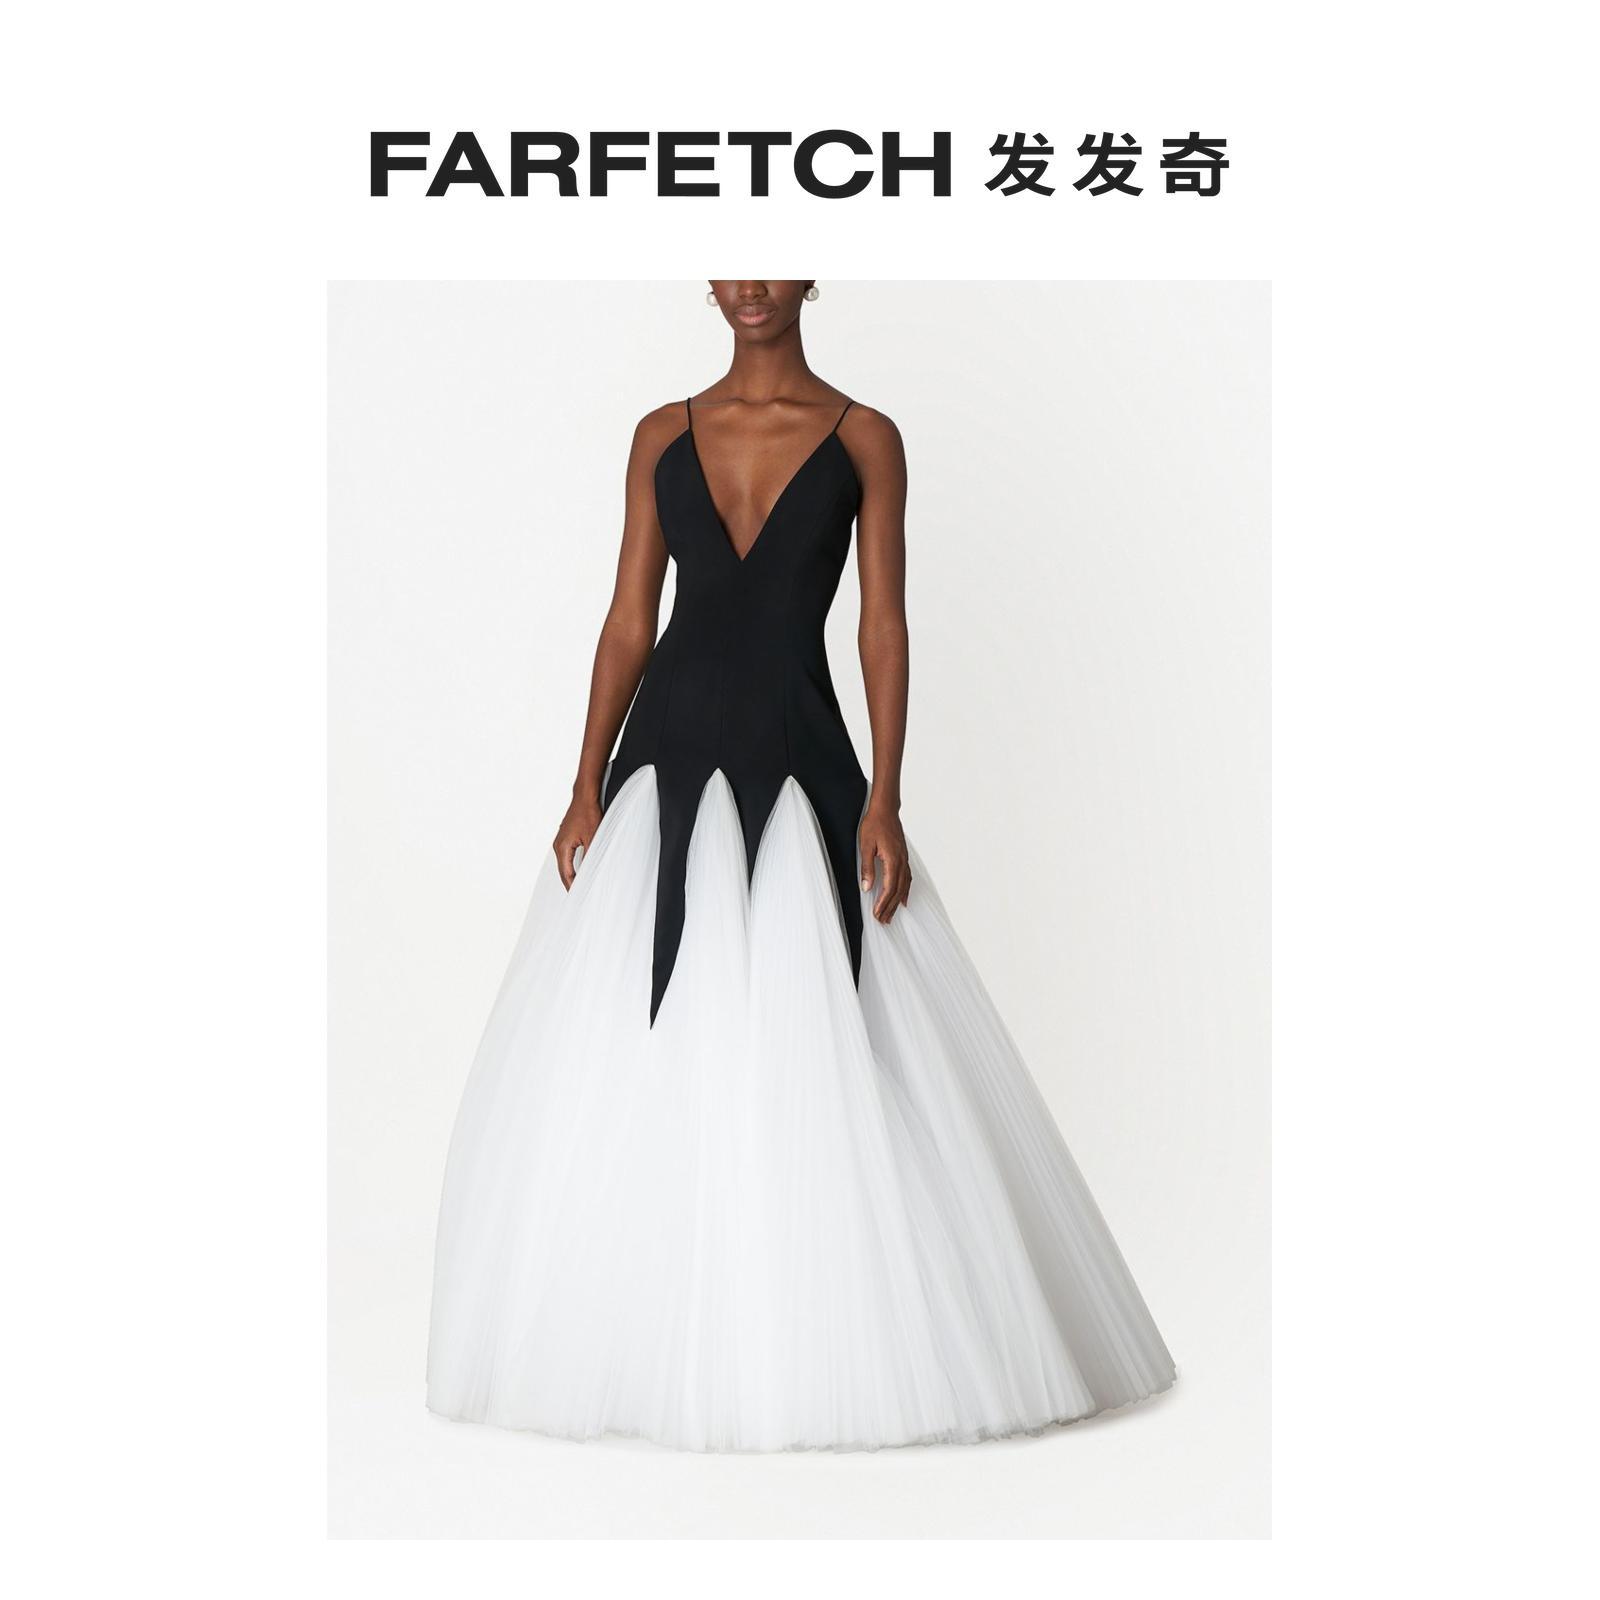 Carolina Herrera女士镂空薄纱分层式礼服FARFETCH发发奇 黑色